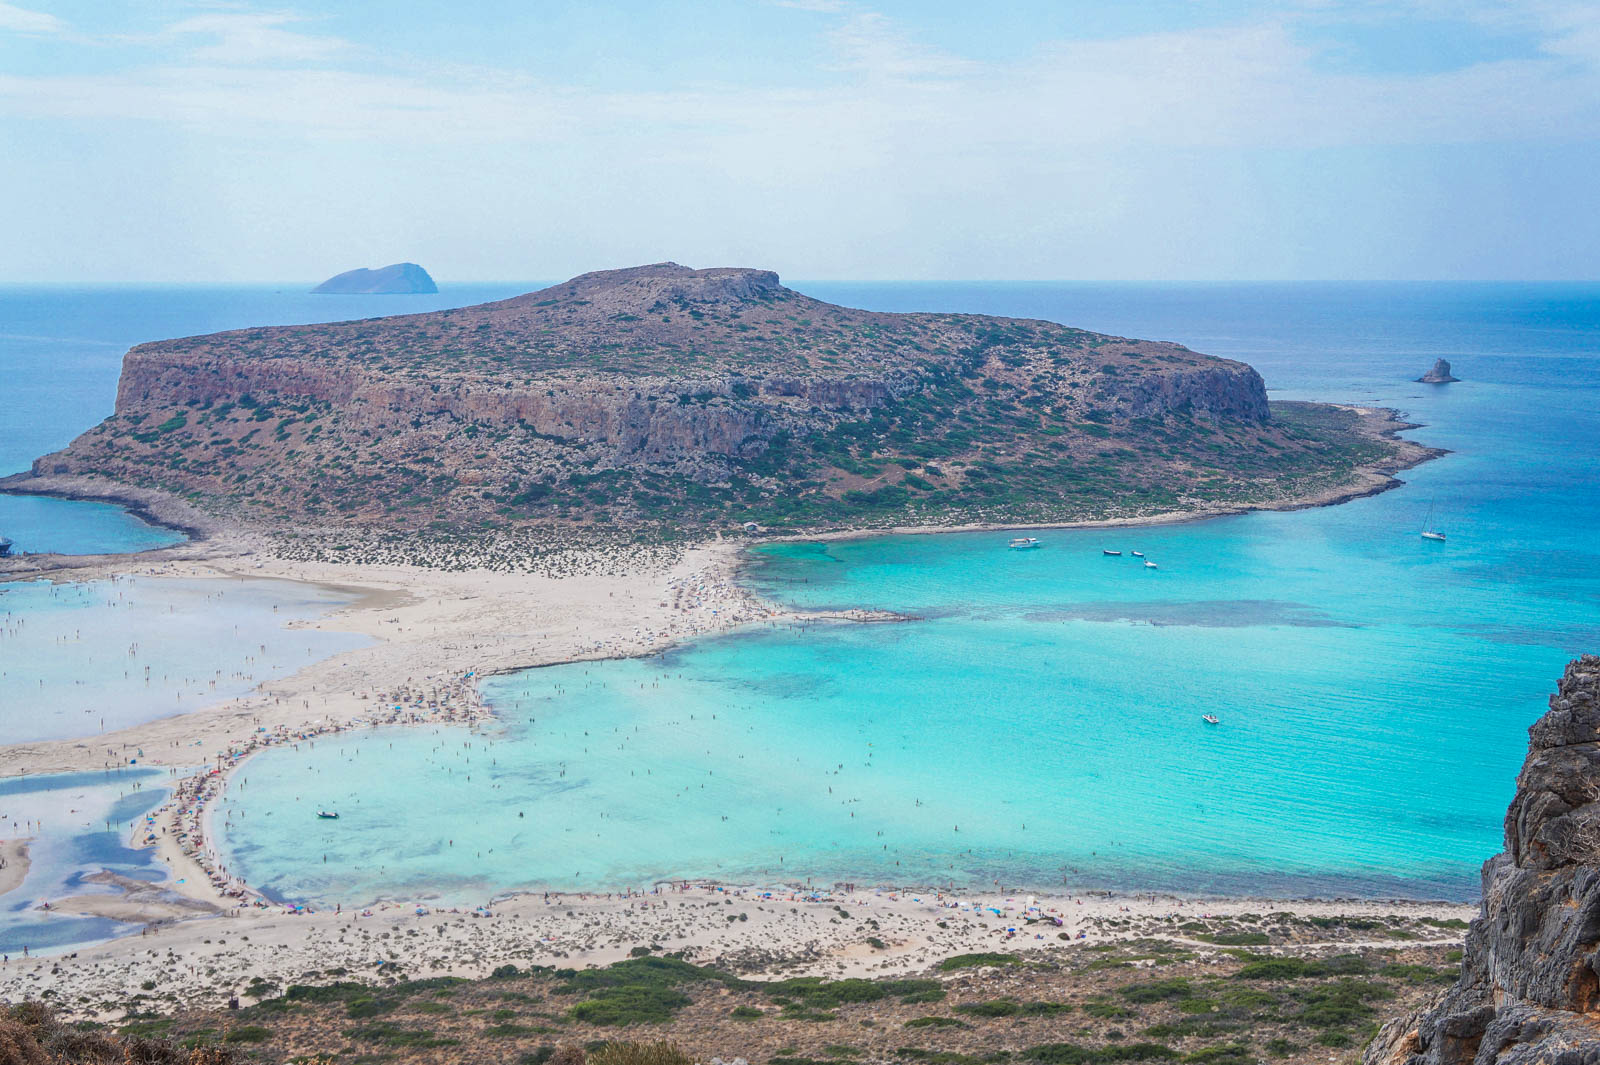 mpalos-beach-crete-greece-la-vie-en-blog-all-rights-reserved-7